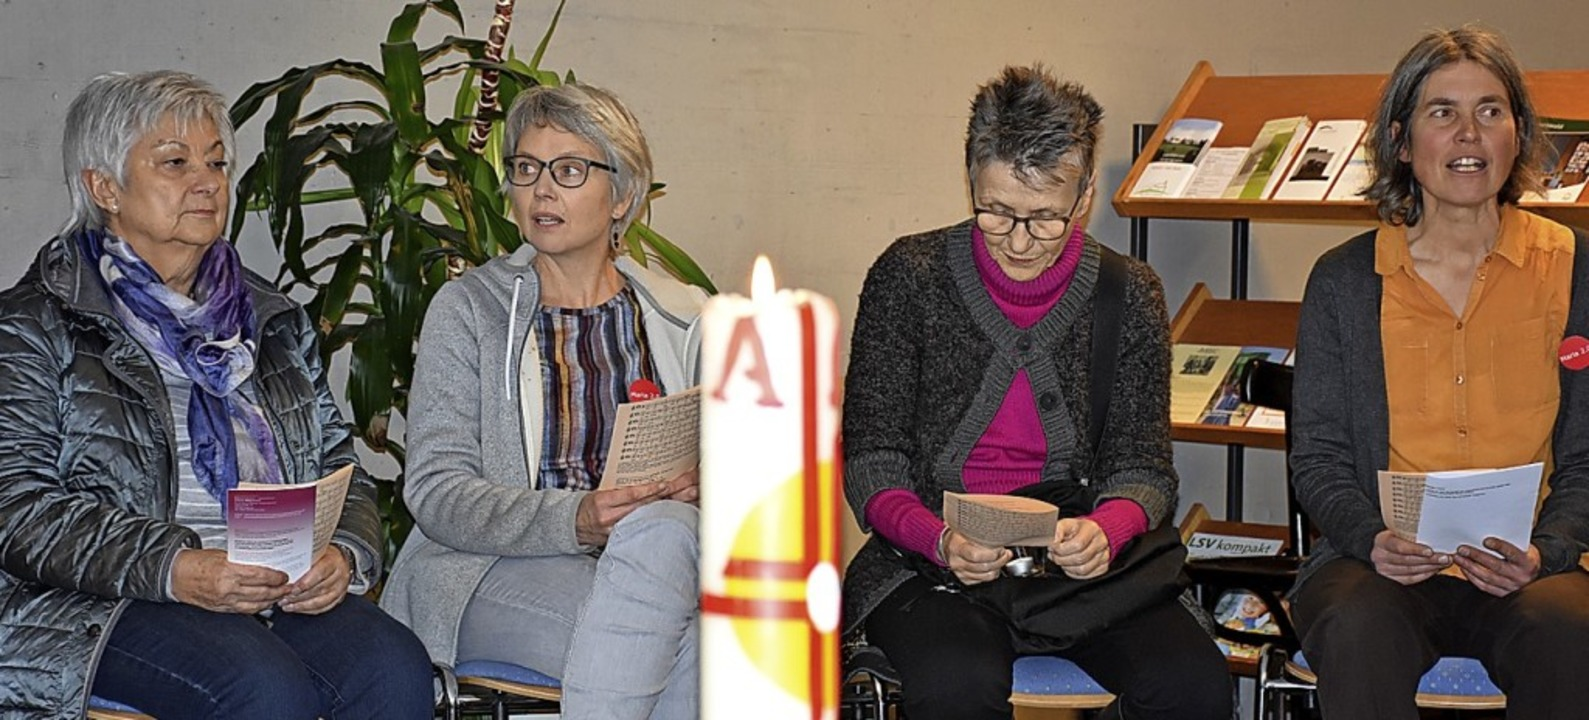 Gedankenaustausch im Pfarrheim     Foto: Thomas Biniossek